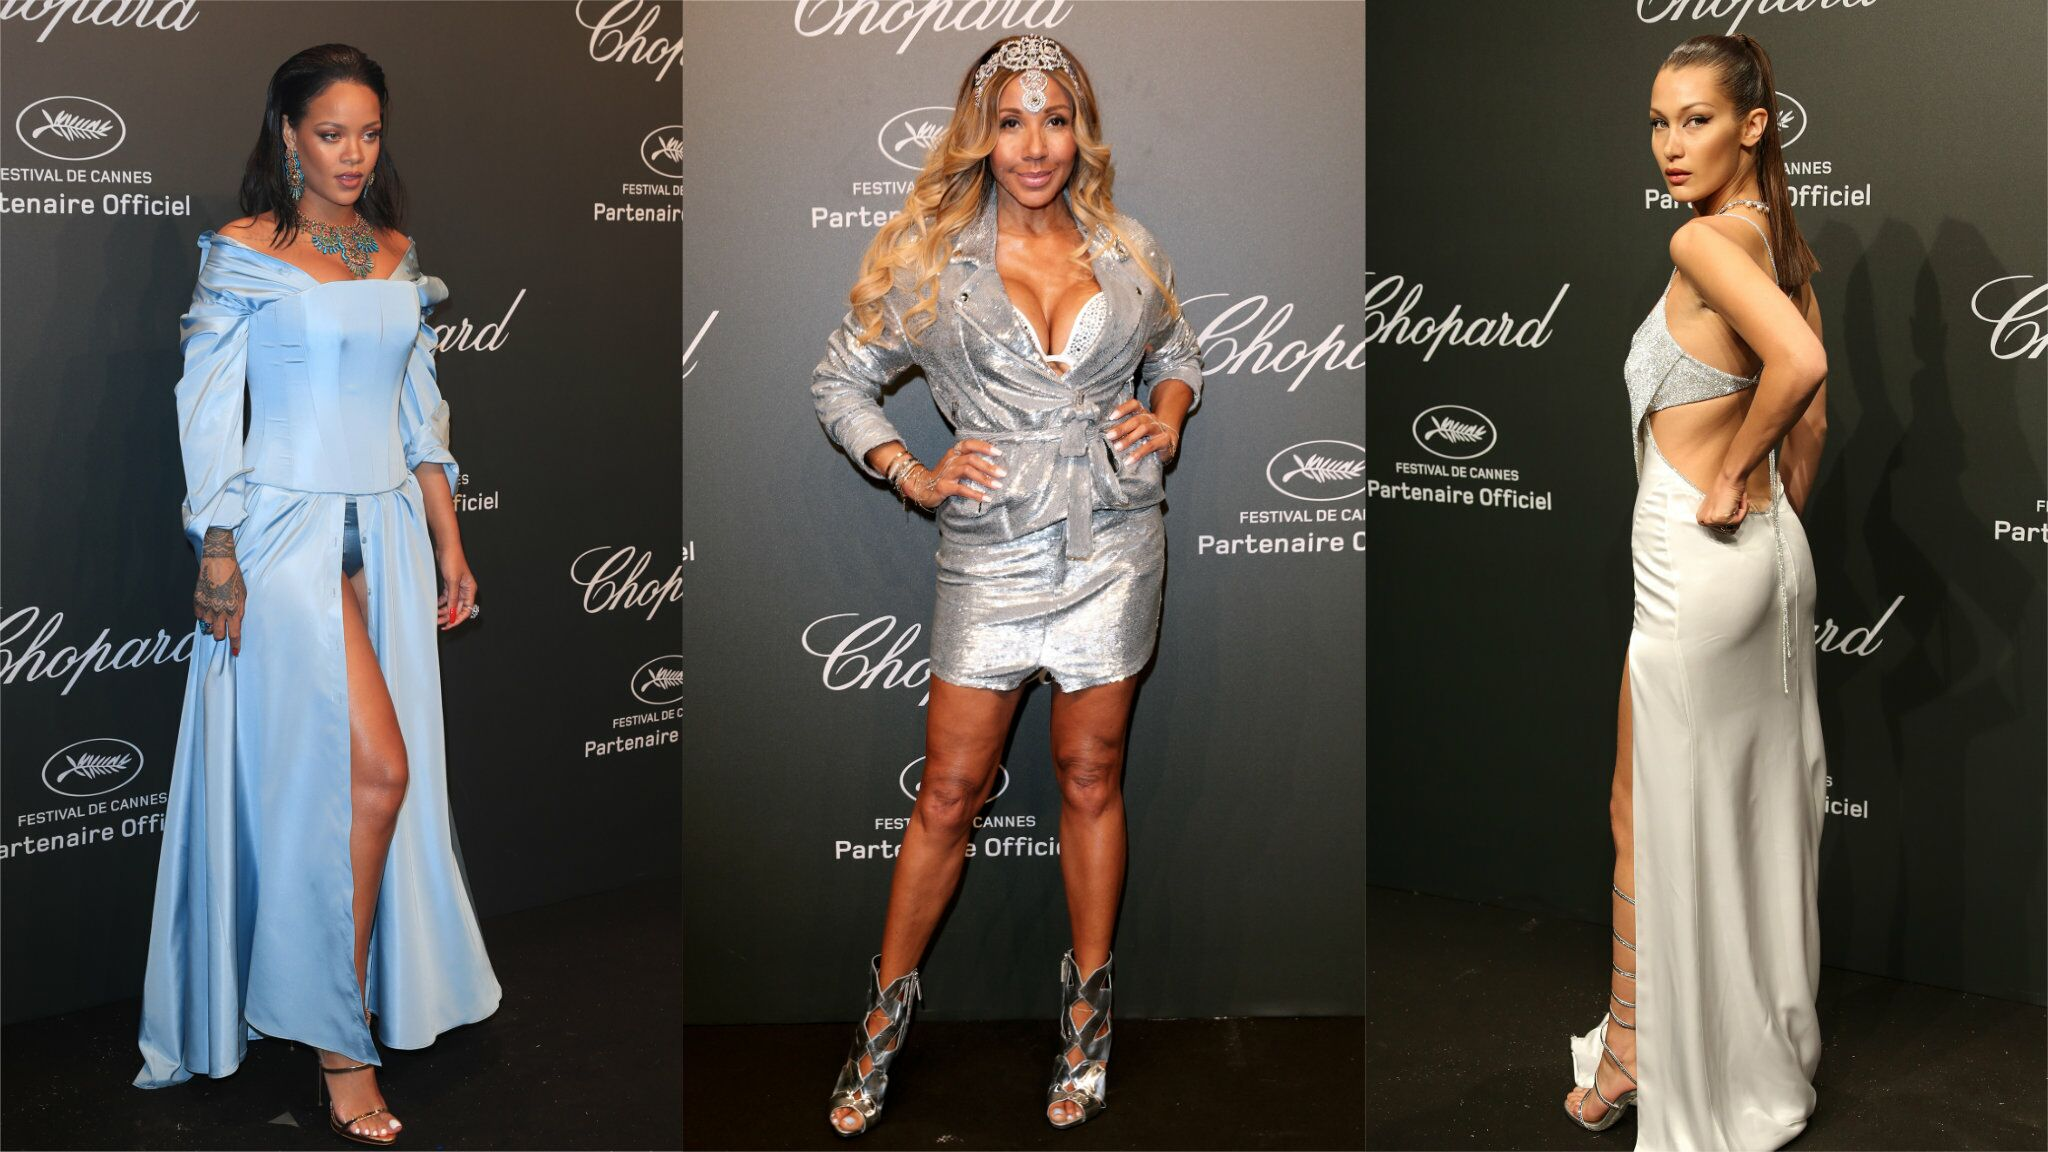 2017Rihanna Montre Ose Photos Le Sa Cannes Guetta CulotteCathy eWE9IbHYD2